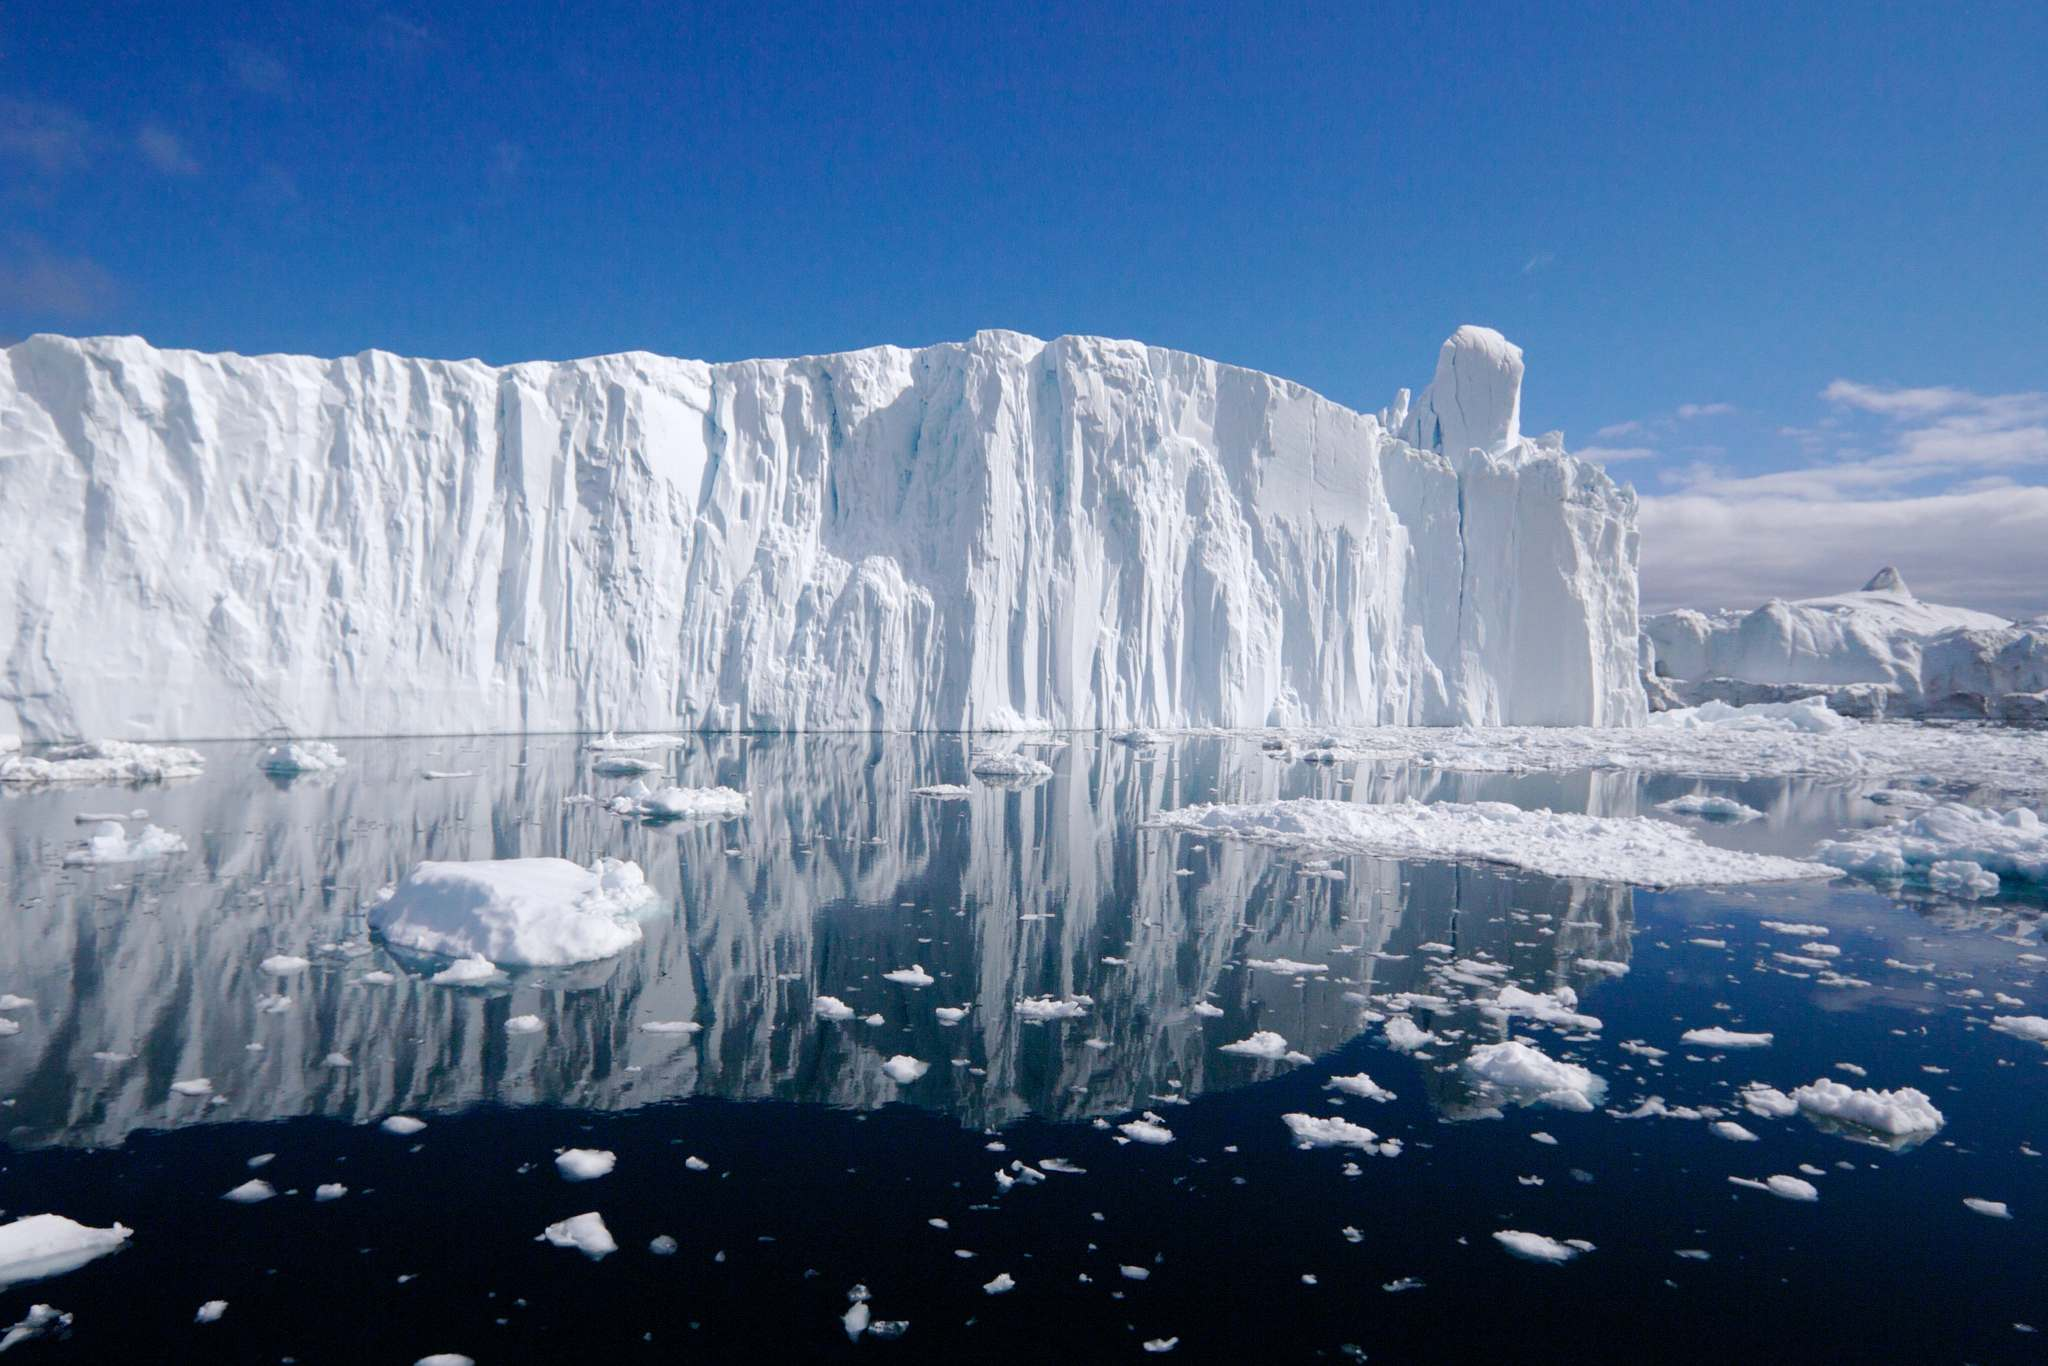 icefjord ilulissat The icefjord in Ilulissat, Greenland